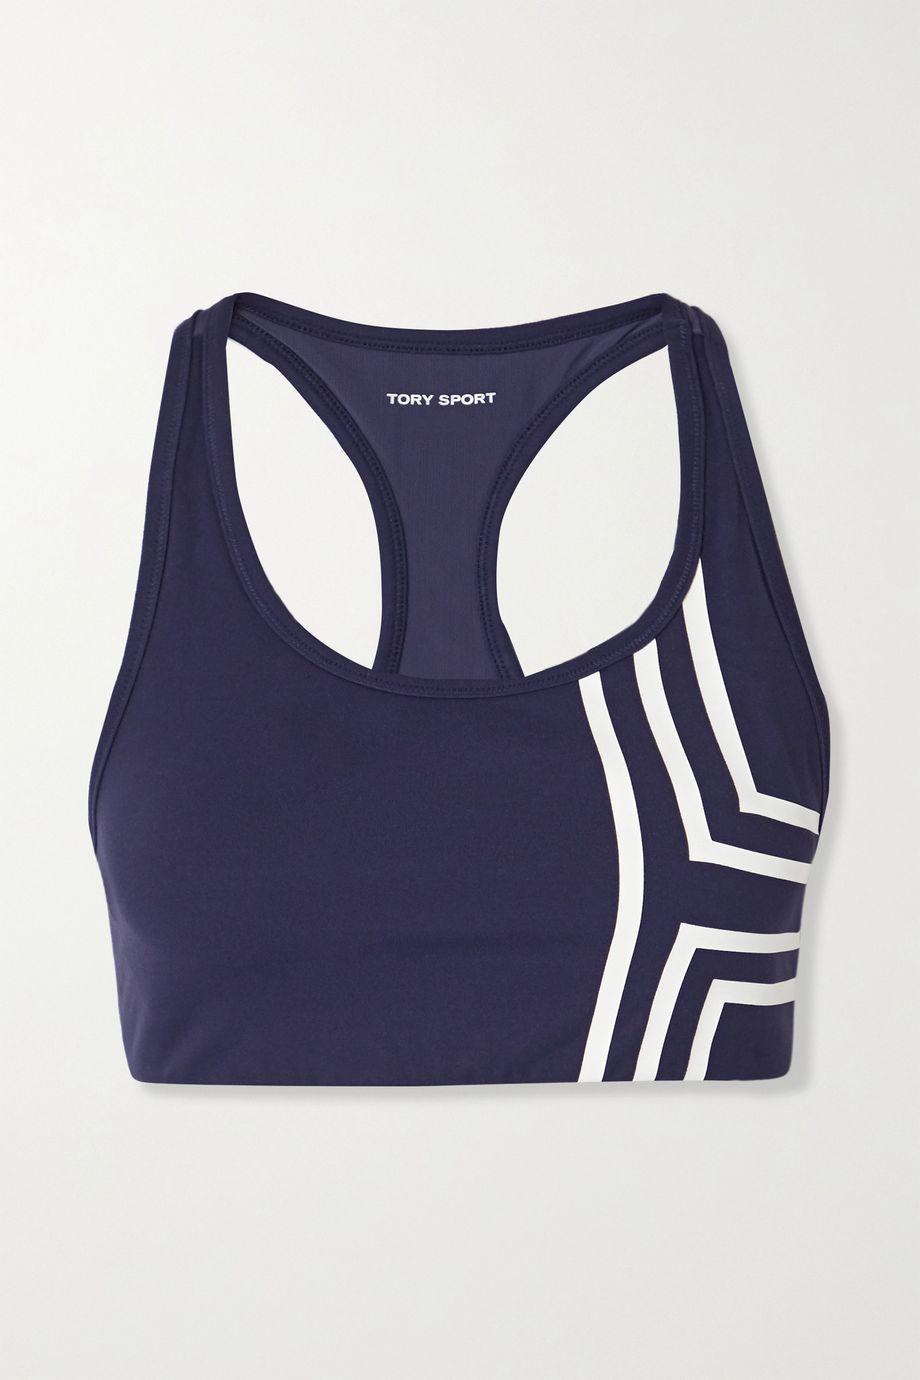 Tory Sport Mesh-trimmed striped stretch-Tactel sports bra